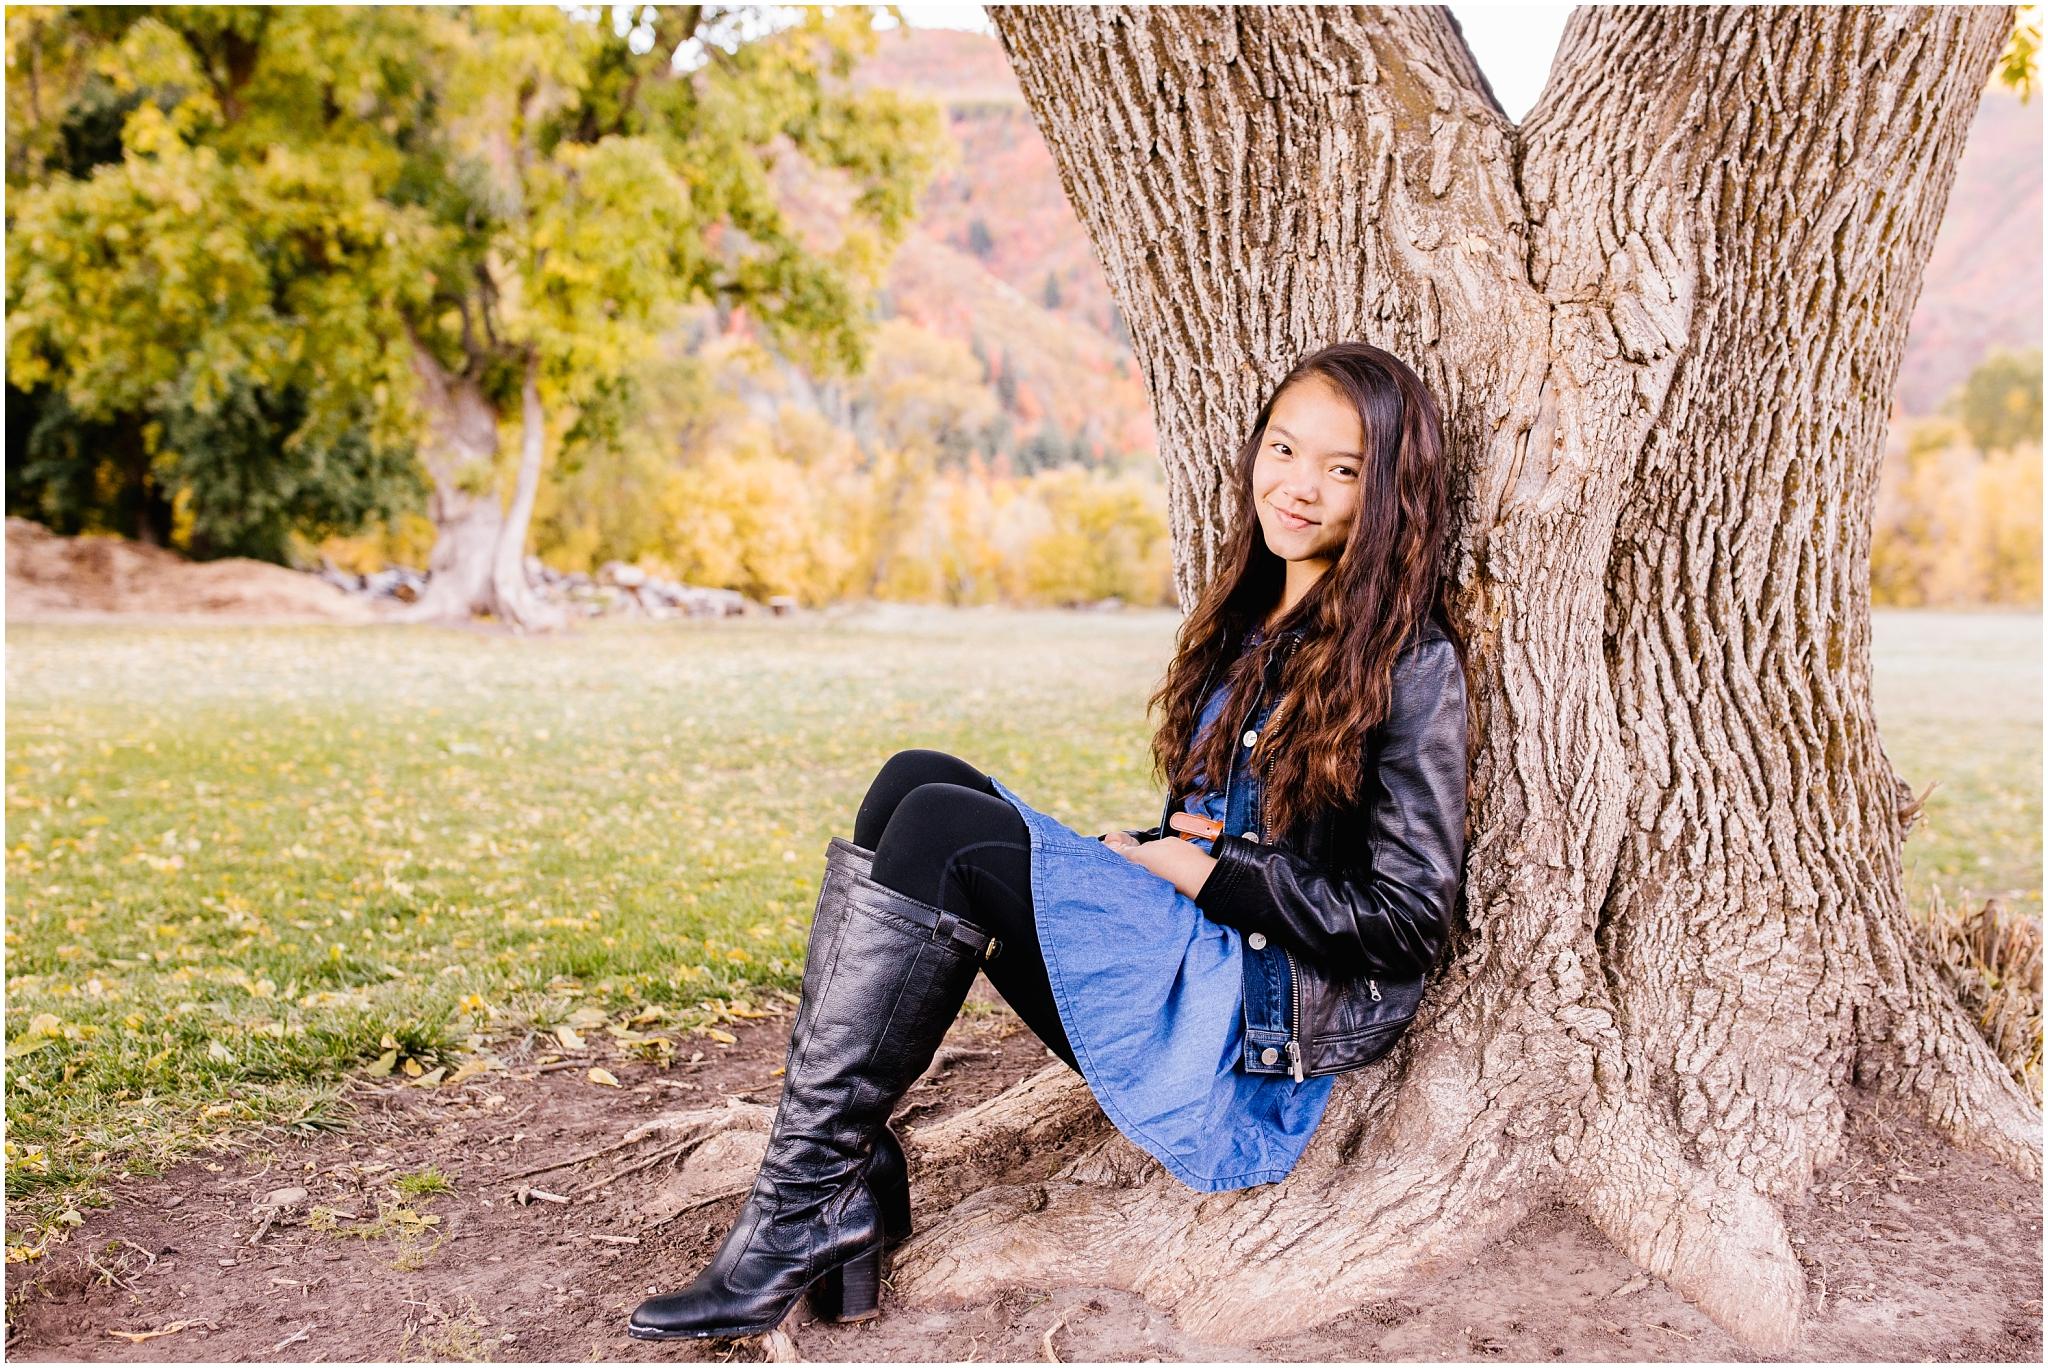 Qian-45_Lizzie-B-Imagery-Utah-Family-Photographer-Salt-Lake-City-Park-City-Utah-County-Hobble-Creek-Canyon-Jolleys-Ranch.jpg